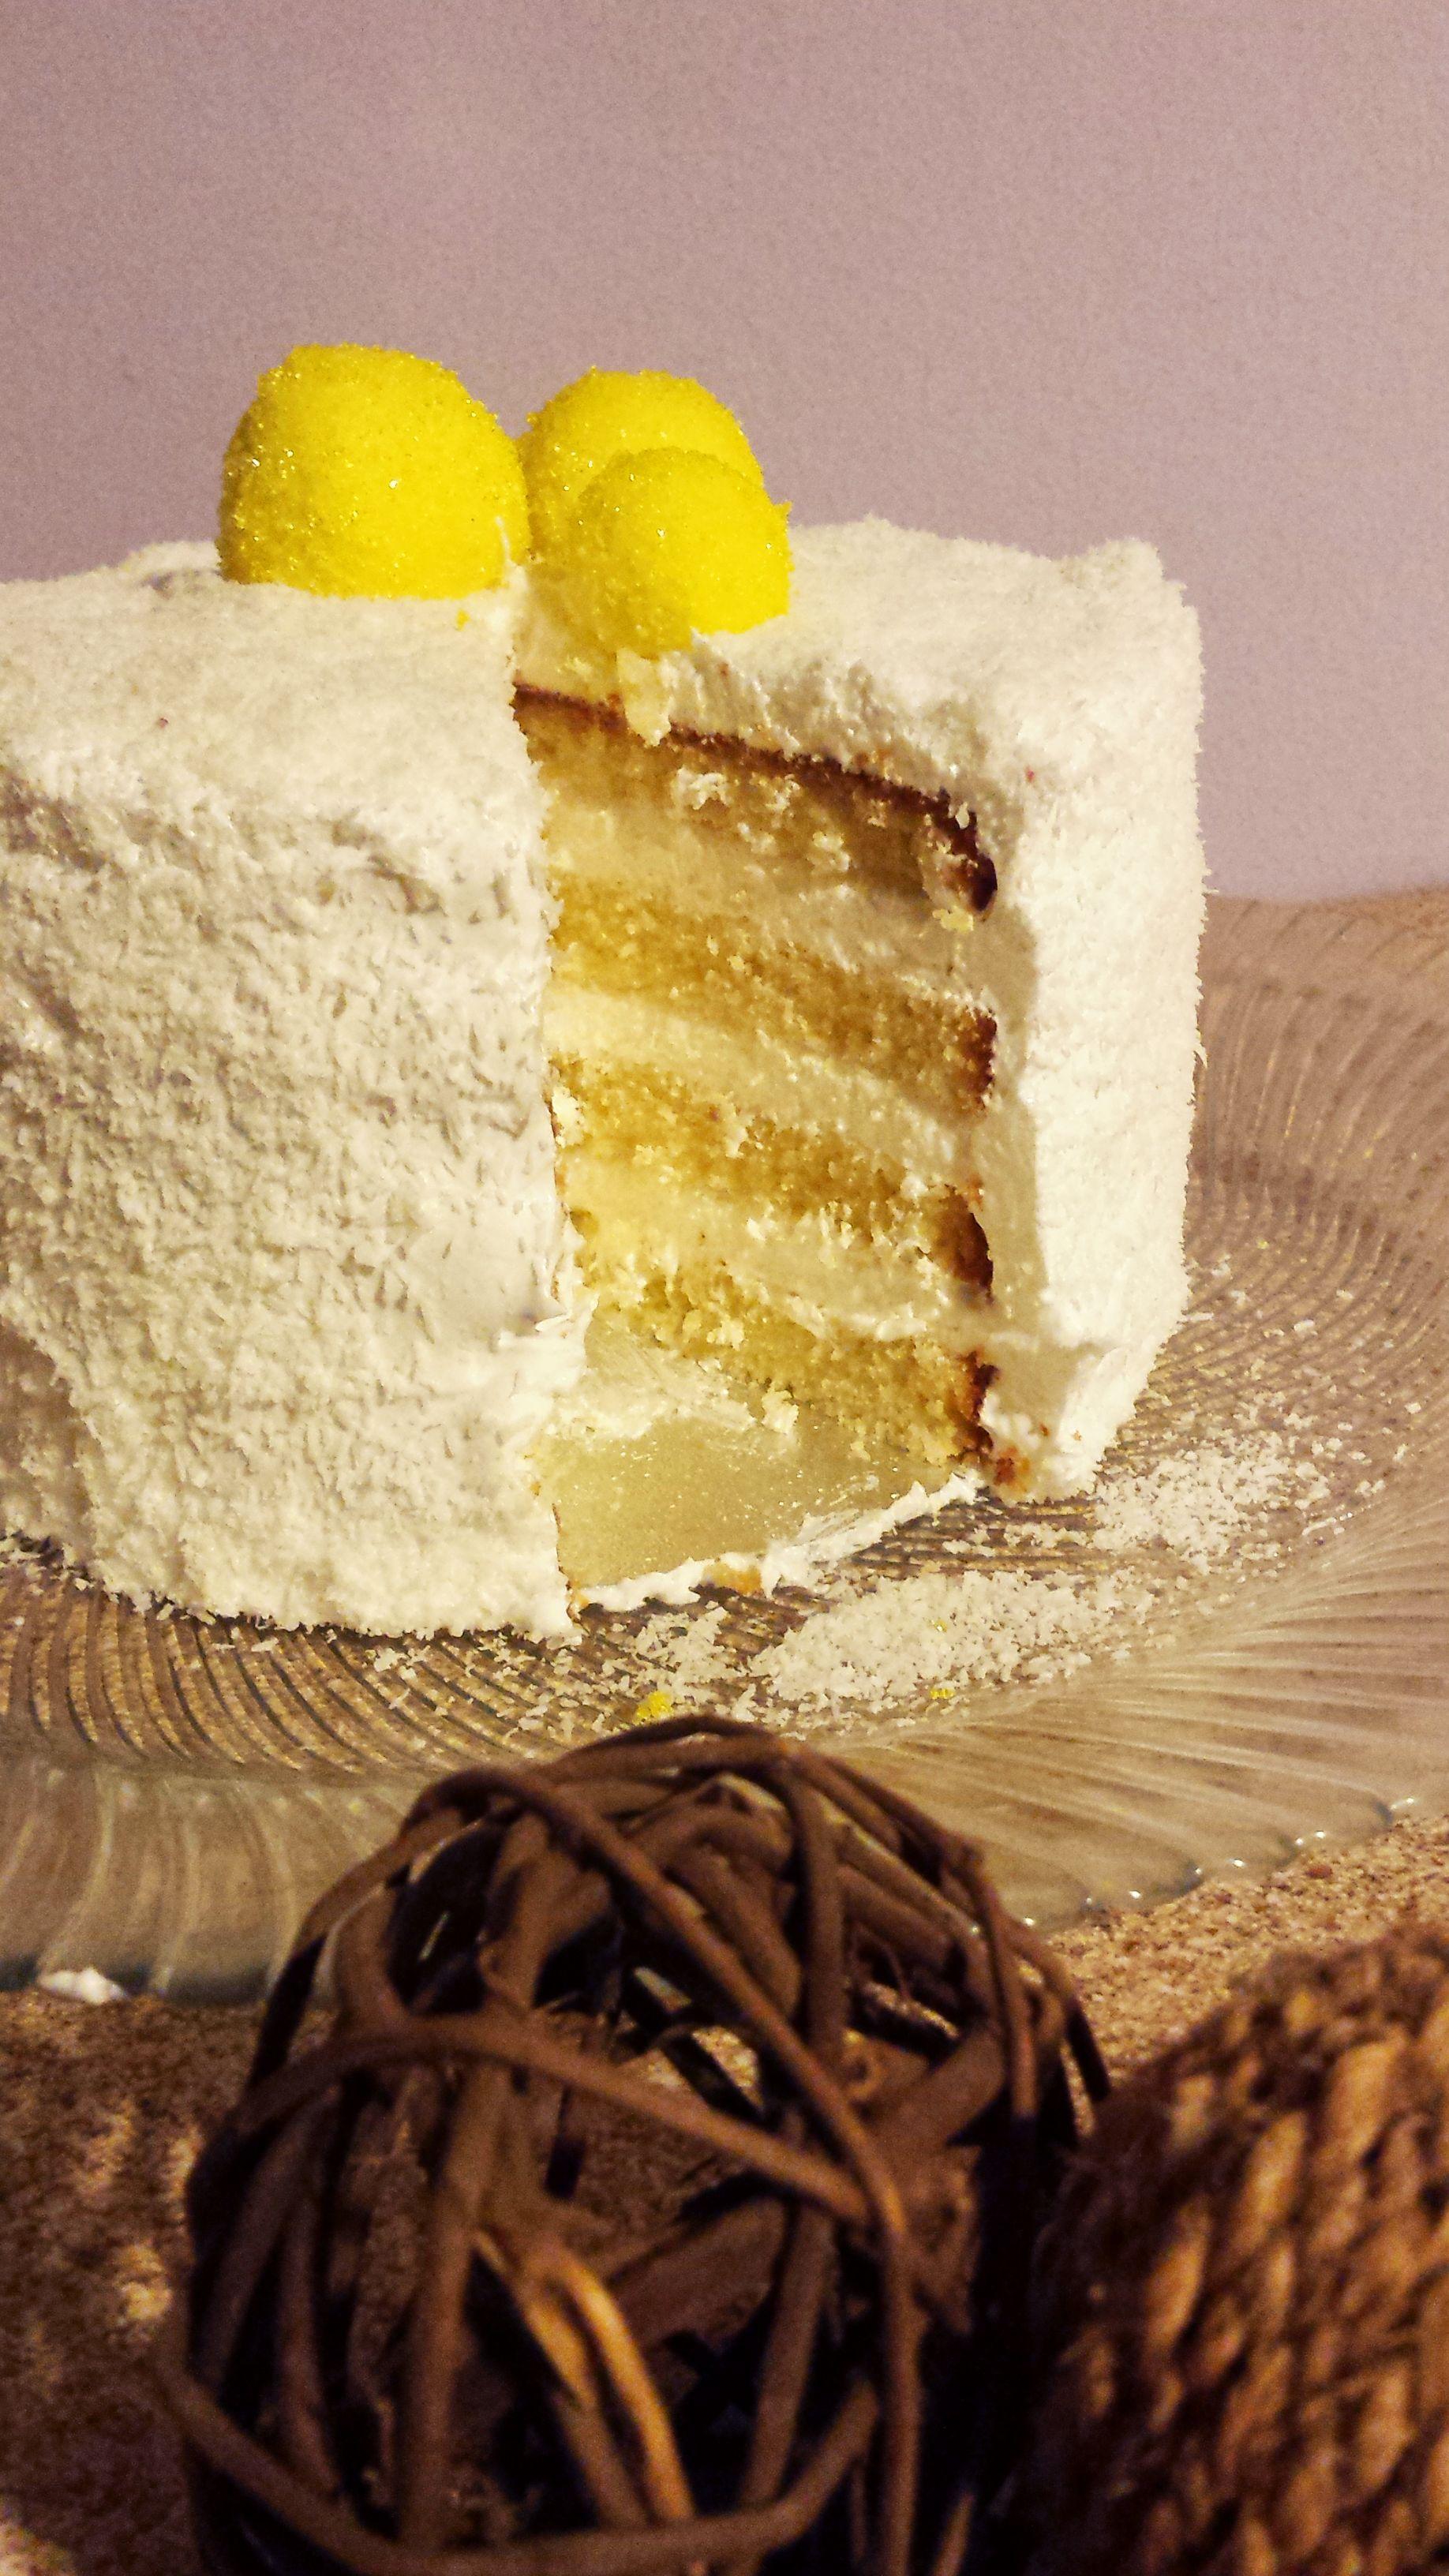 Vanilla cake with vanilla cream and coconut flakes